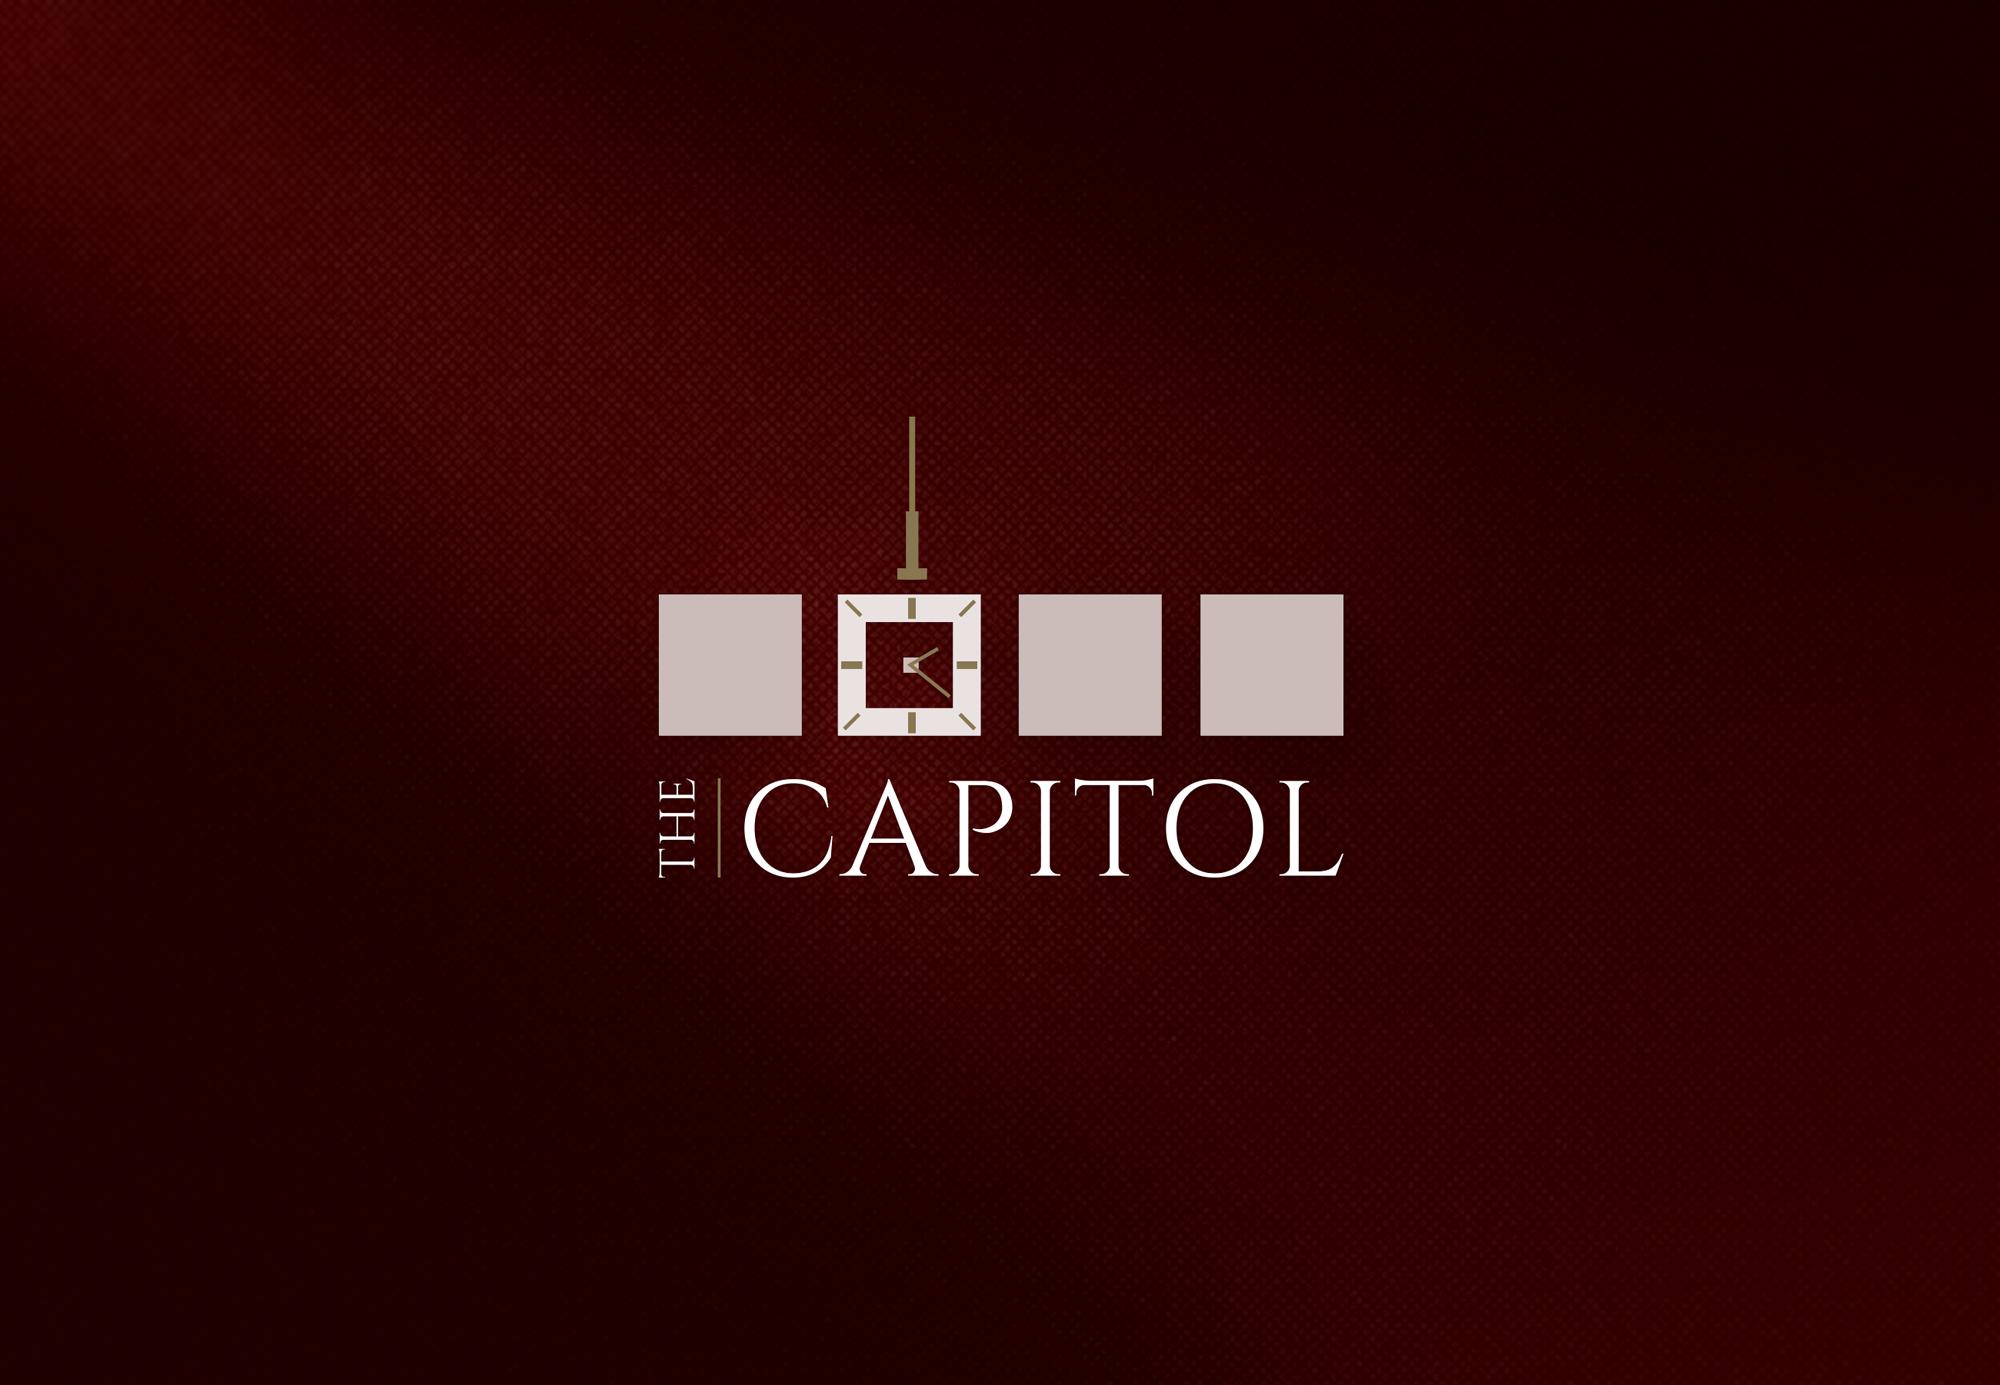 Capitol Branding